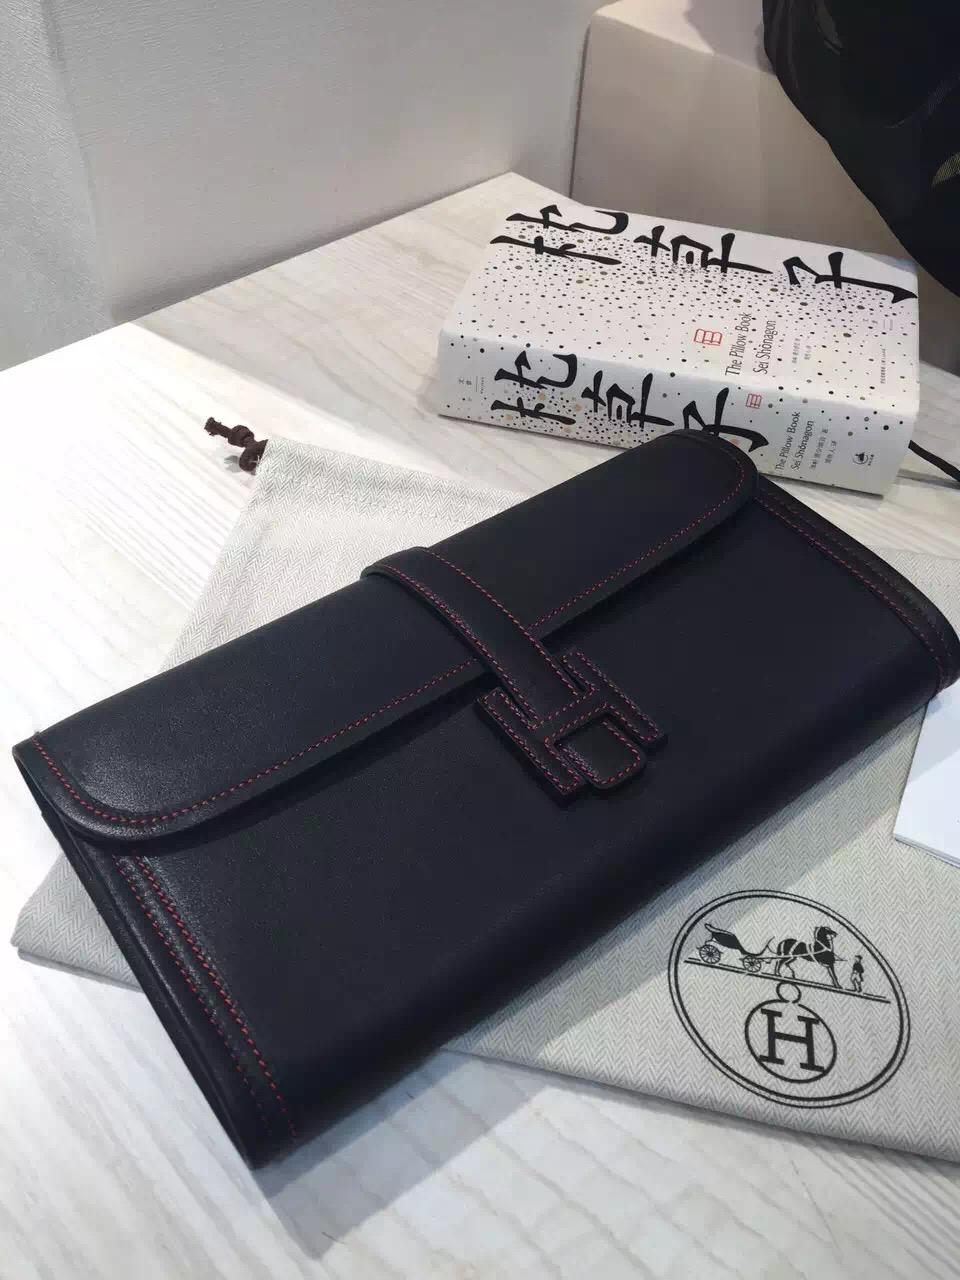 Hand Stitching Hermes Swift Leather Jige Elan Clutch Handbag in Black